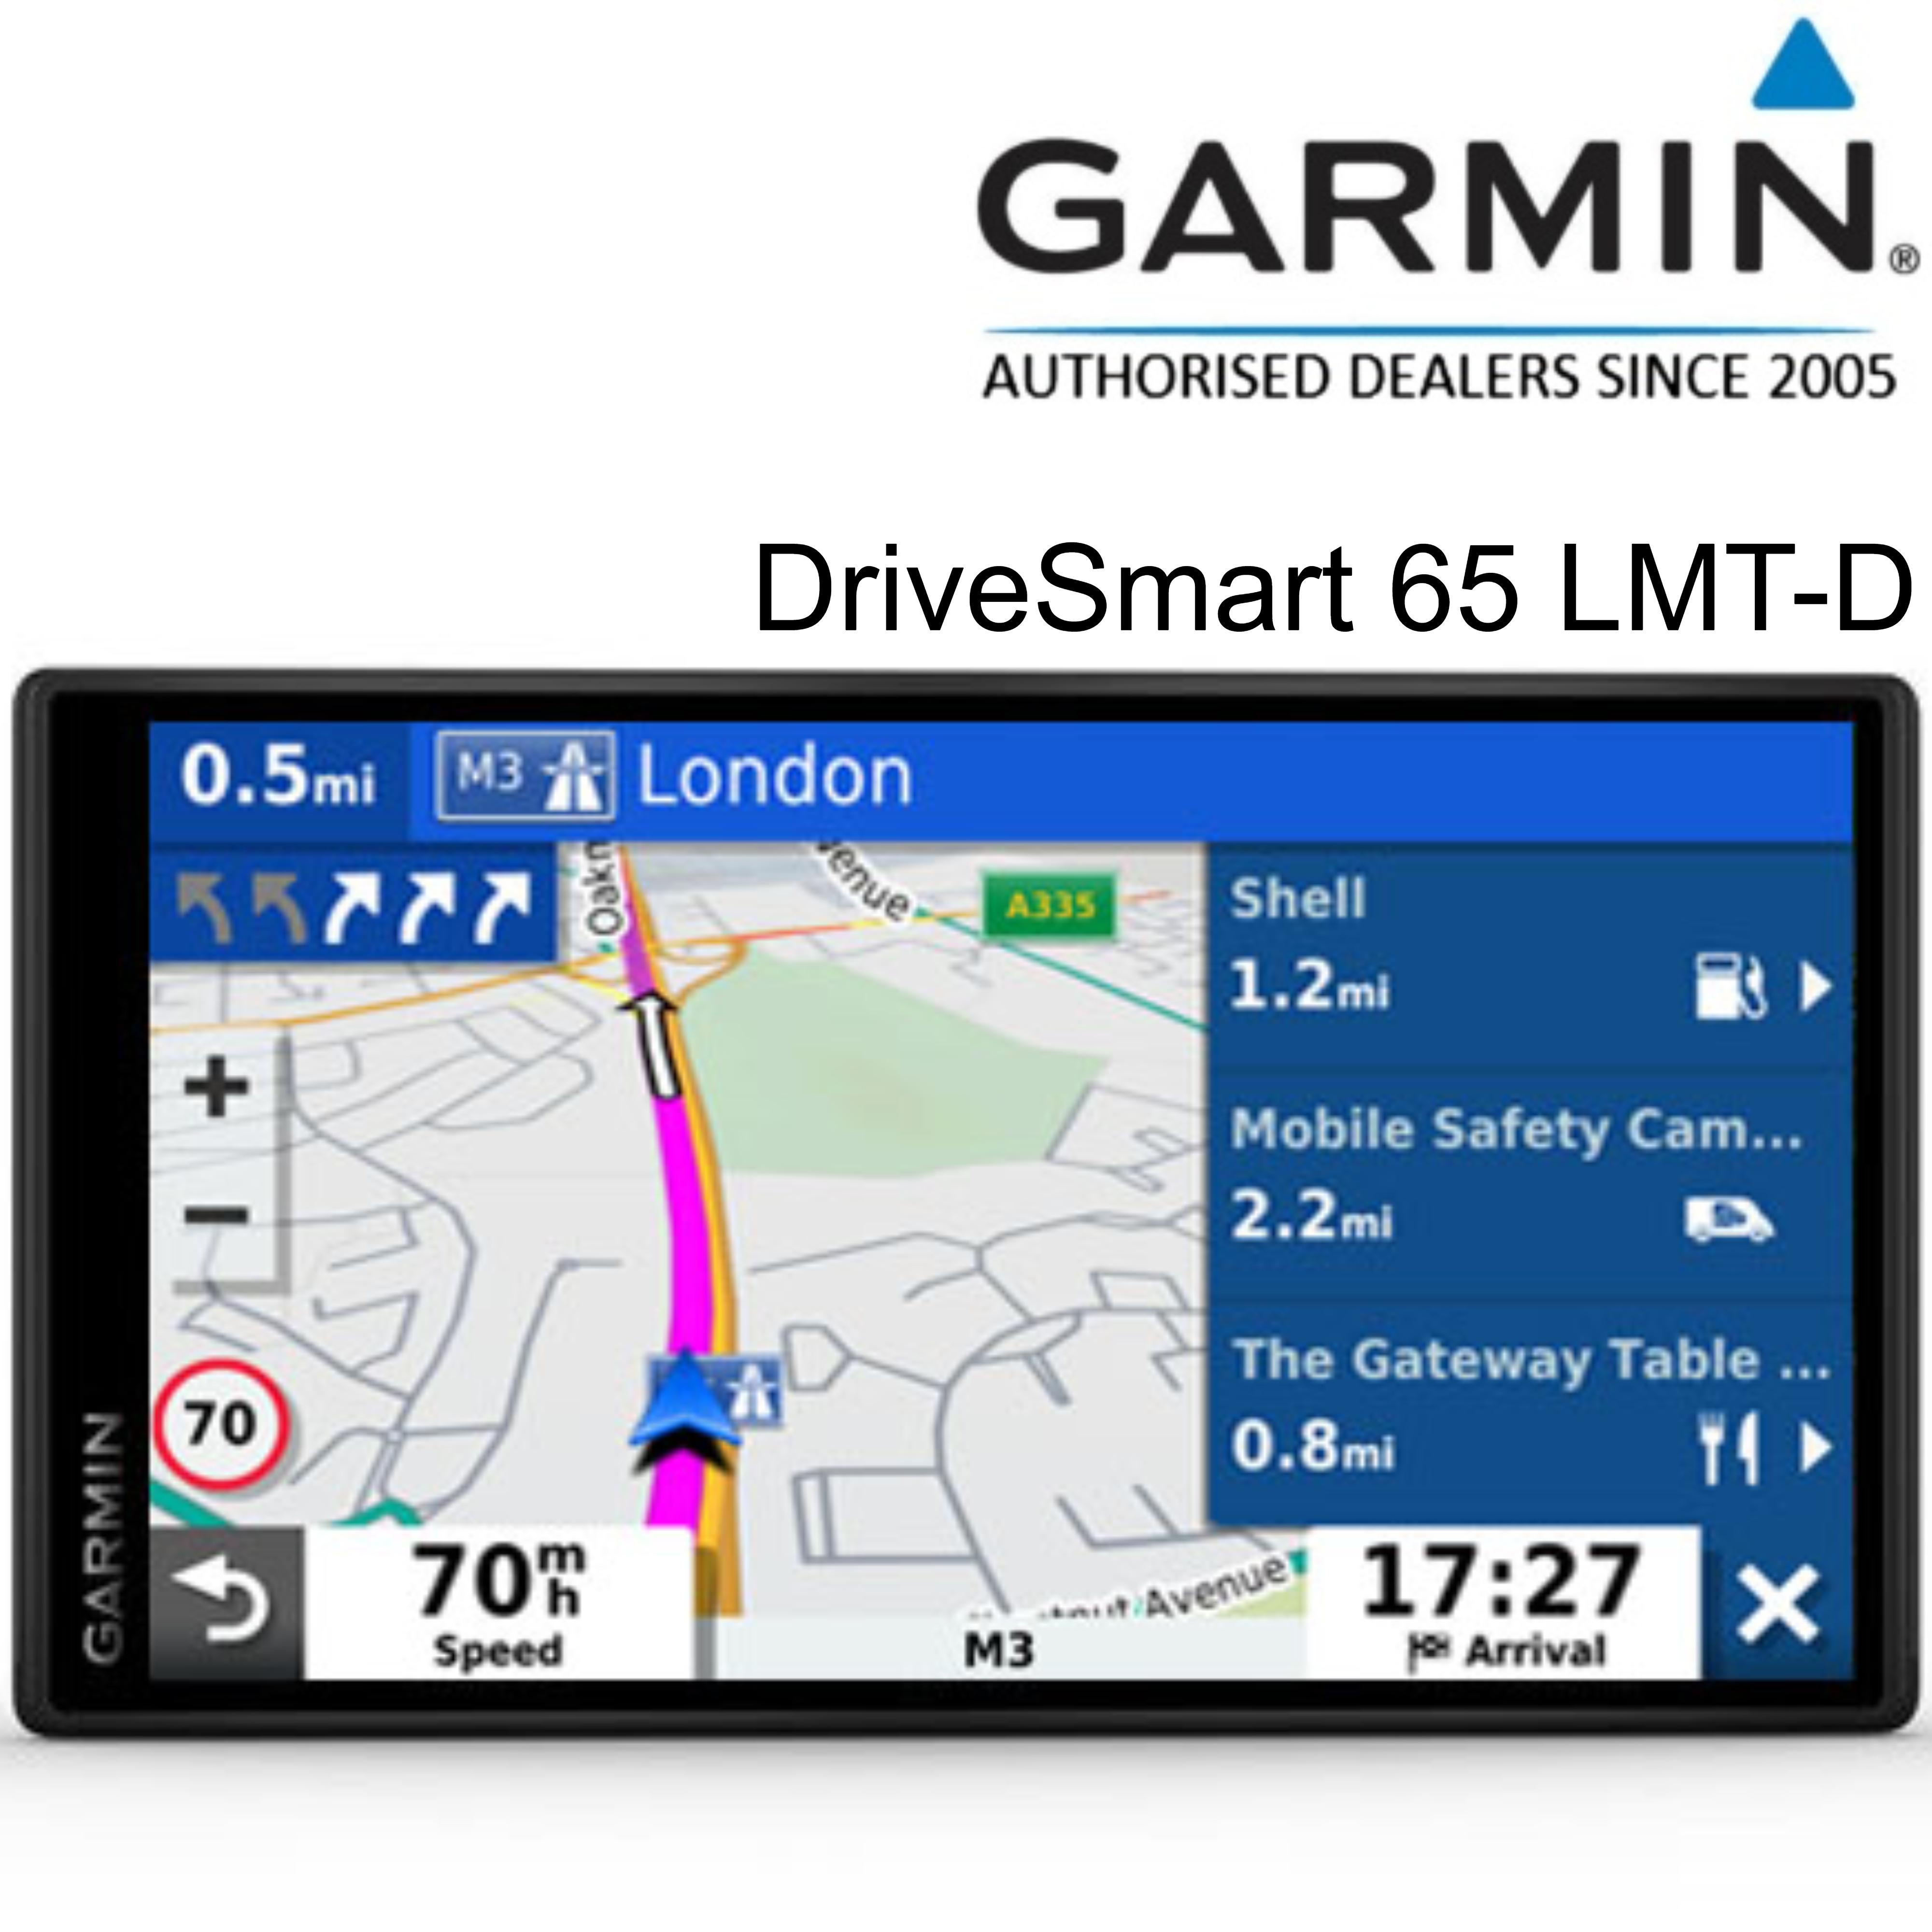 Garmin DriveSmart 65 LMT-D GPS SatNav | Full Europe Lifetime Map Updates + Digital Traffic